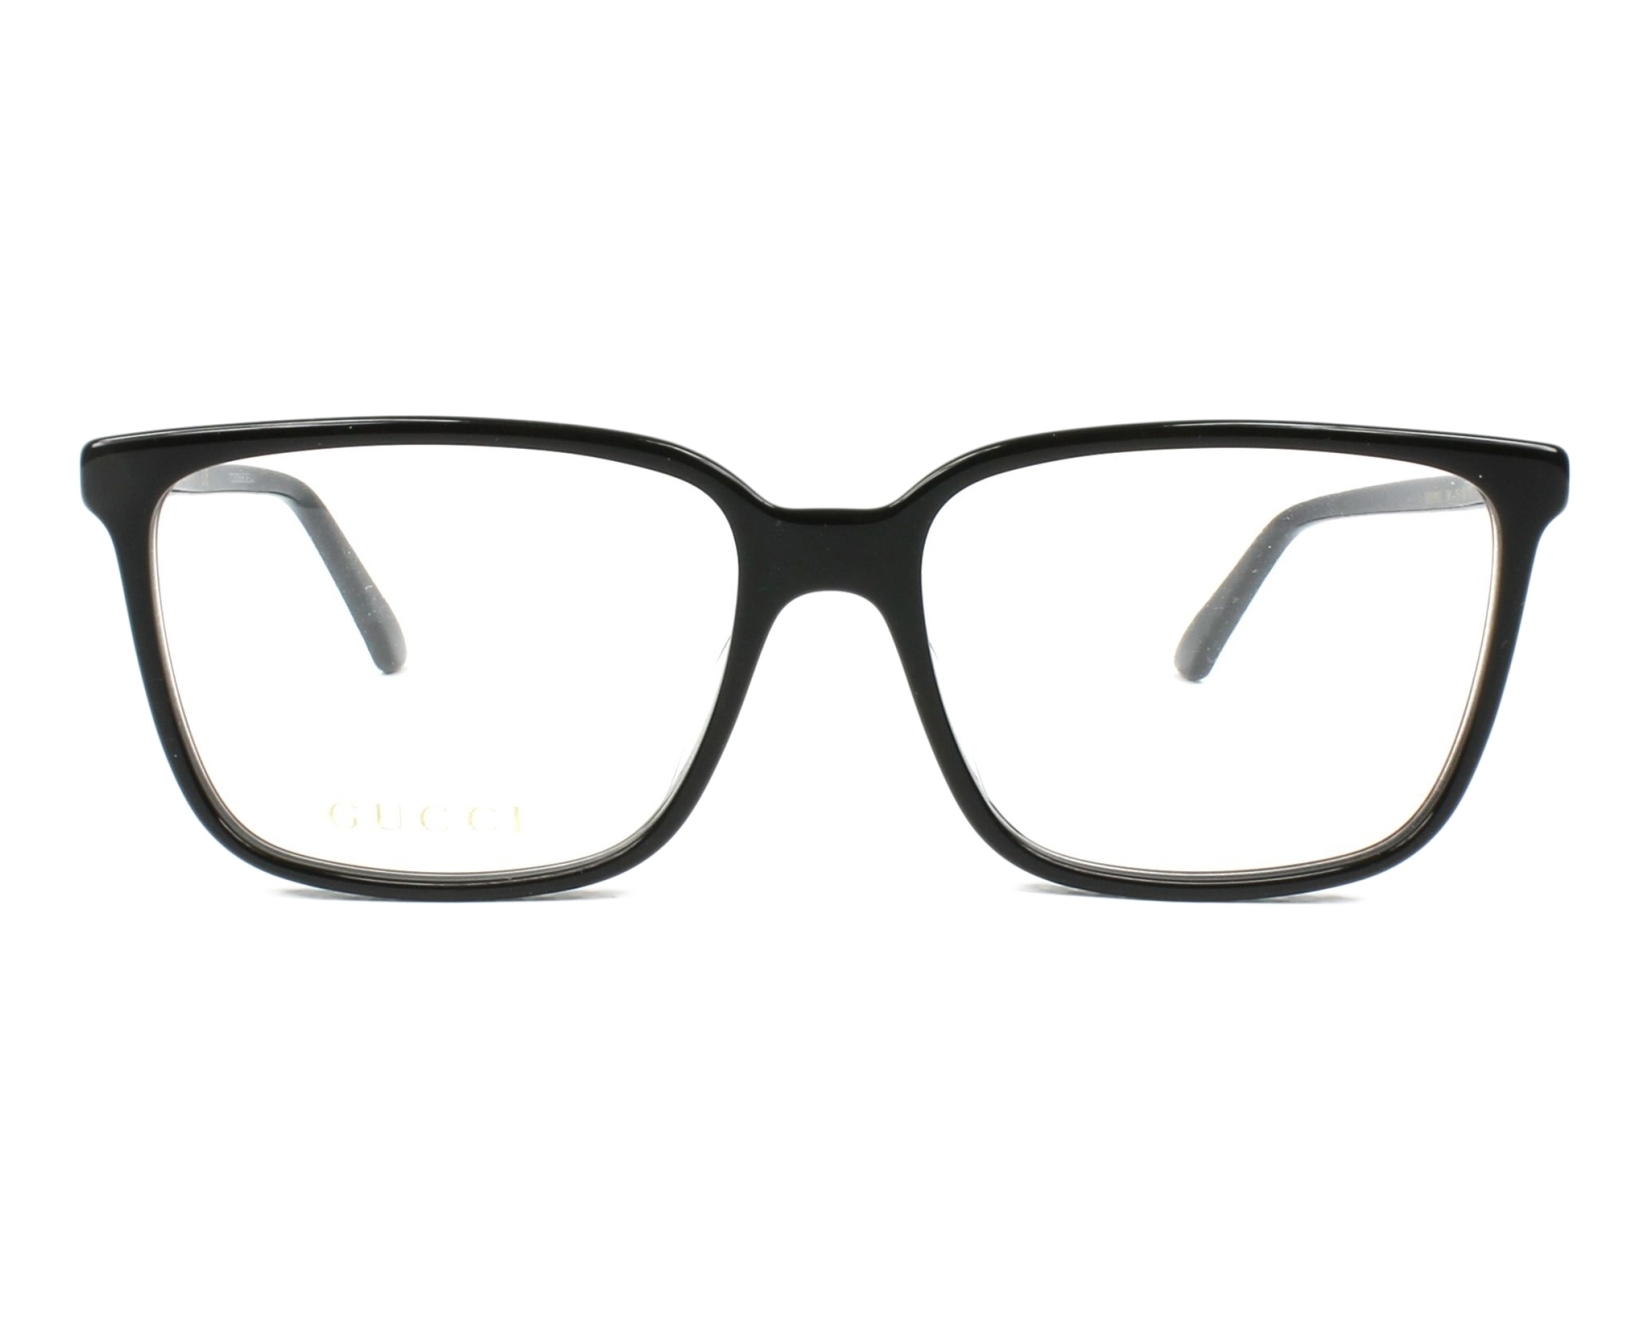 78dd5c5f8a0 eyeglasses Gucci GG-00190 001 56-16 Black front view